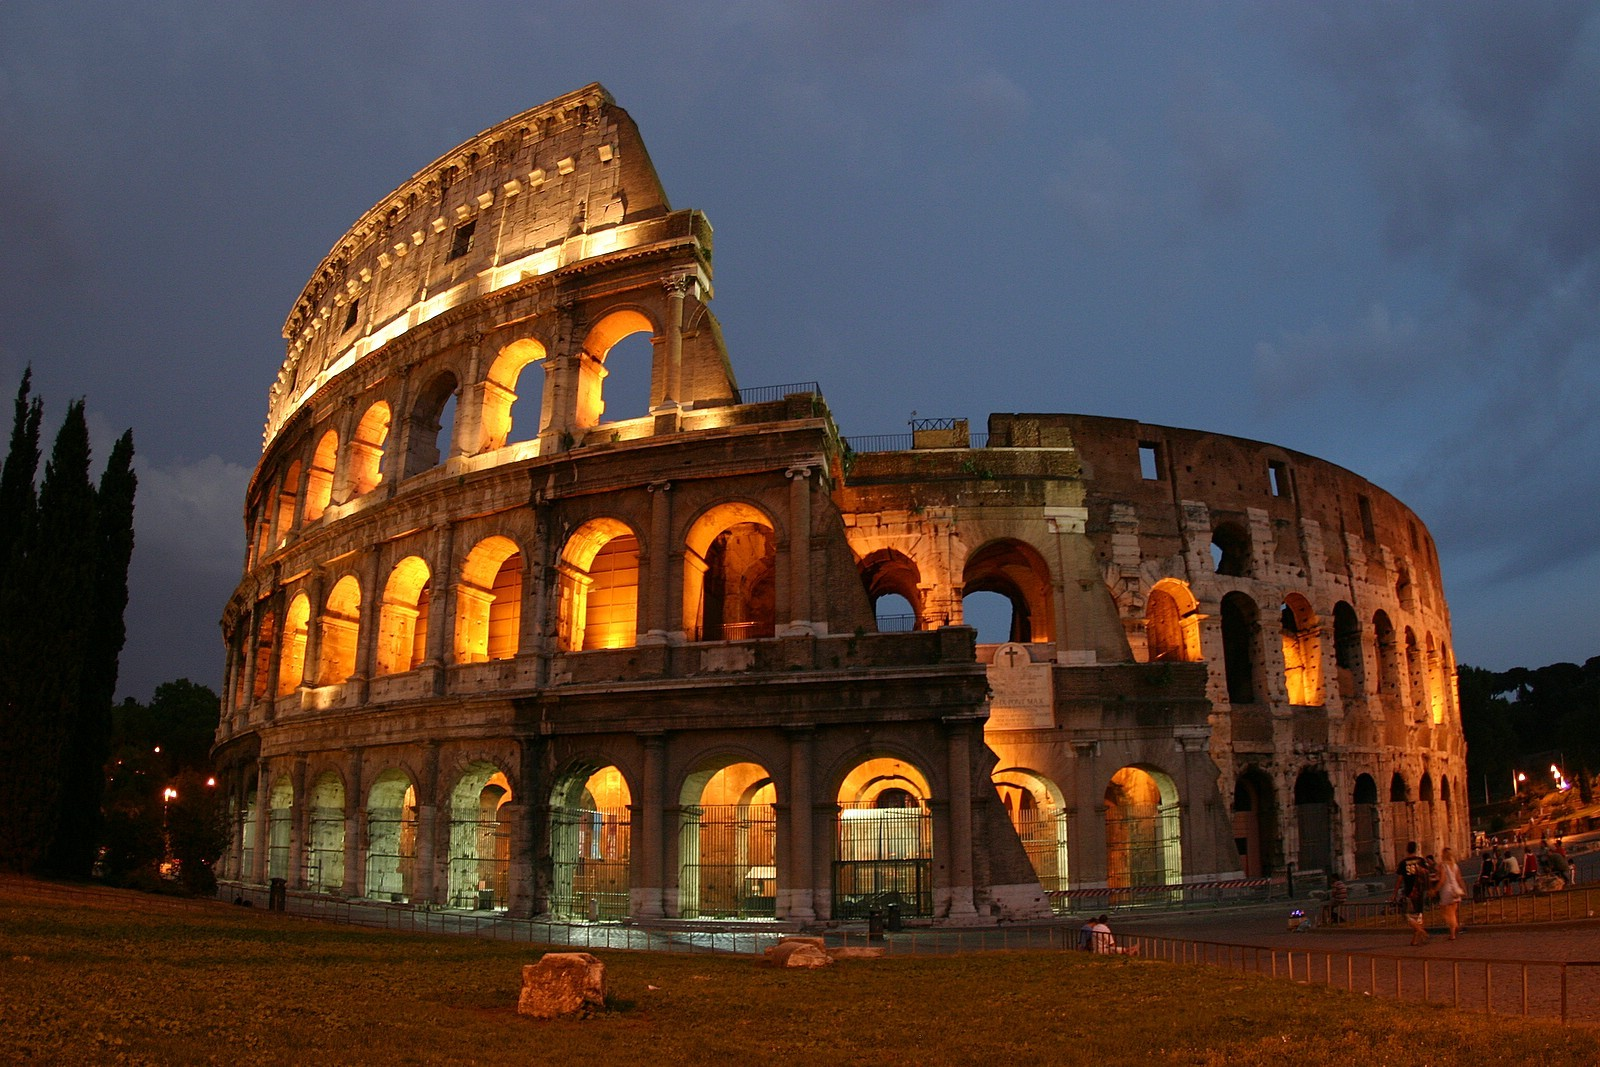 Колизей в Риме - описание и история амфитеатра